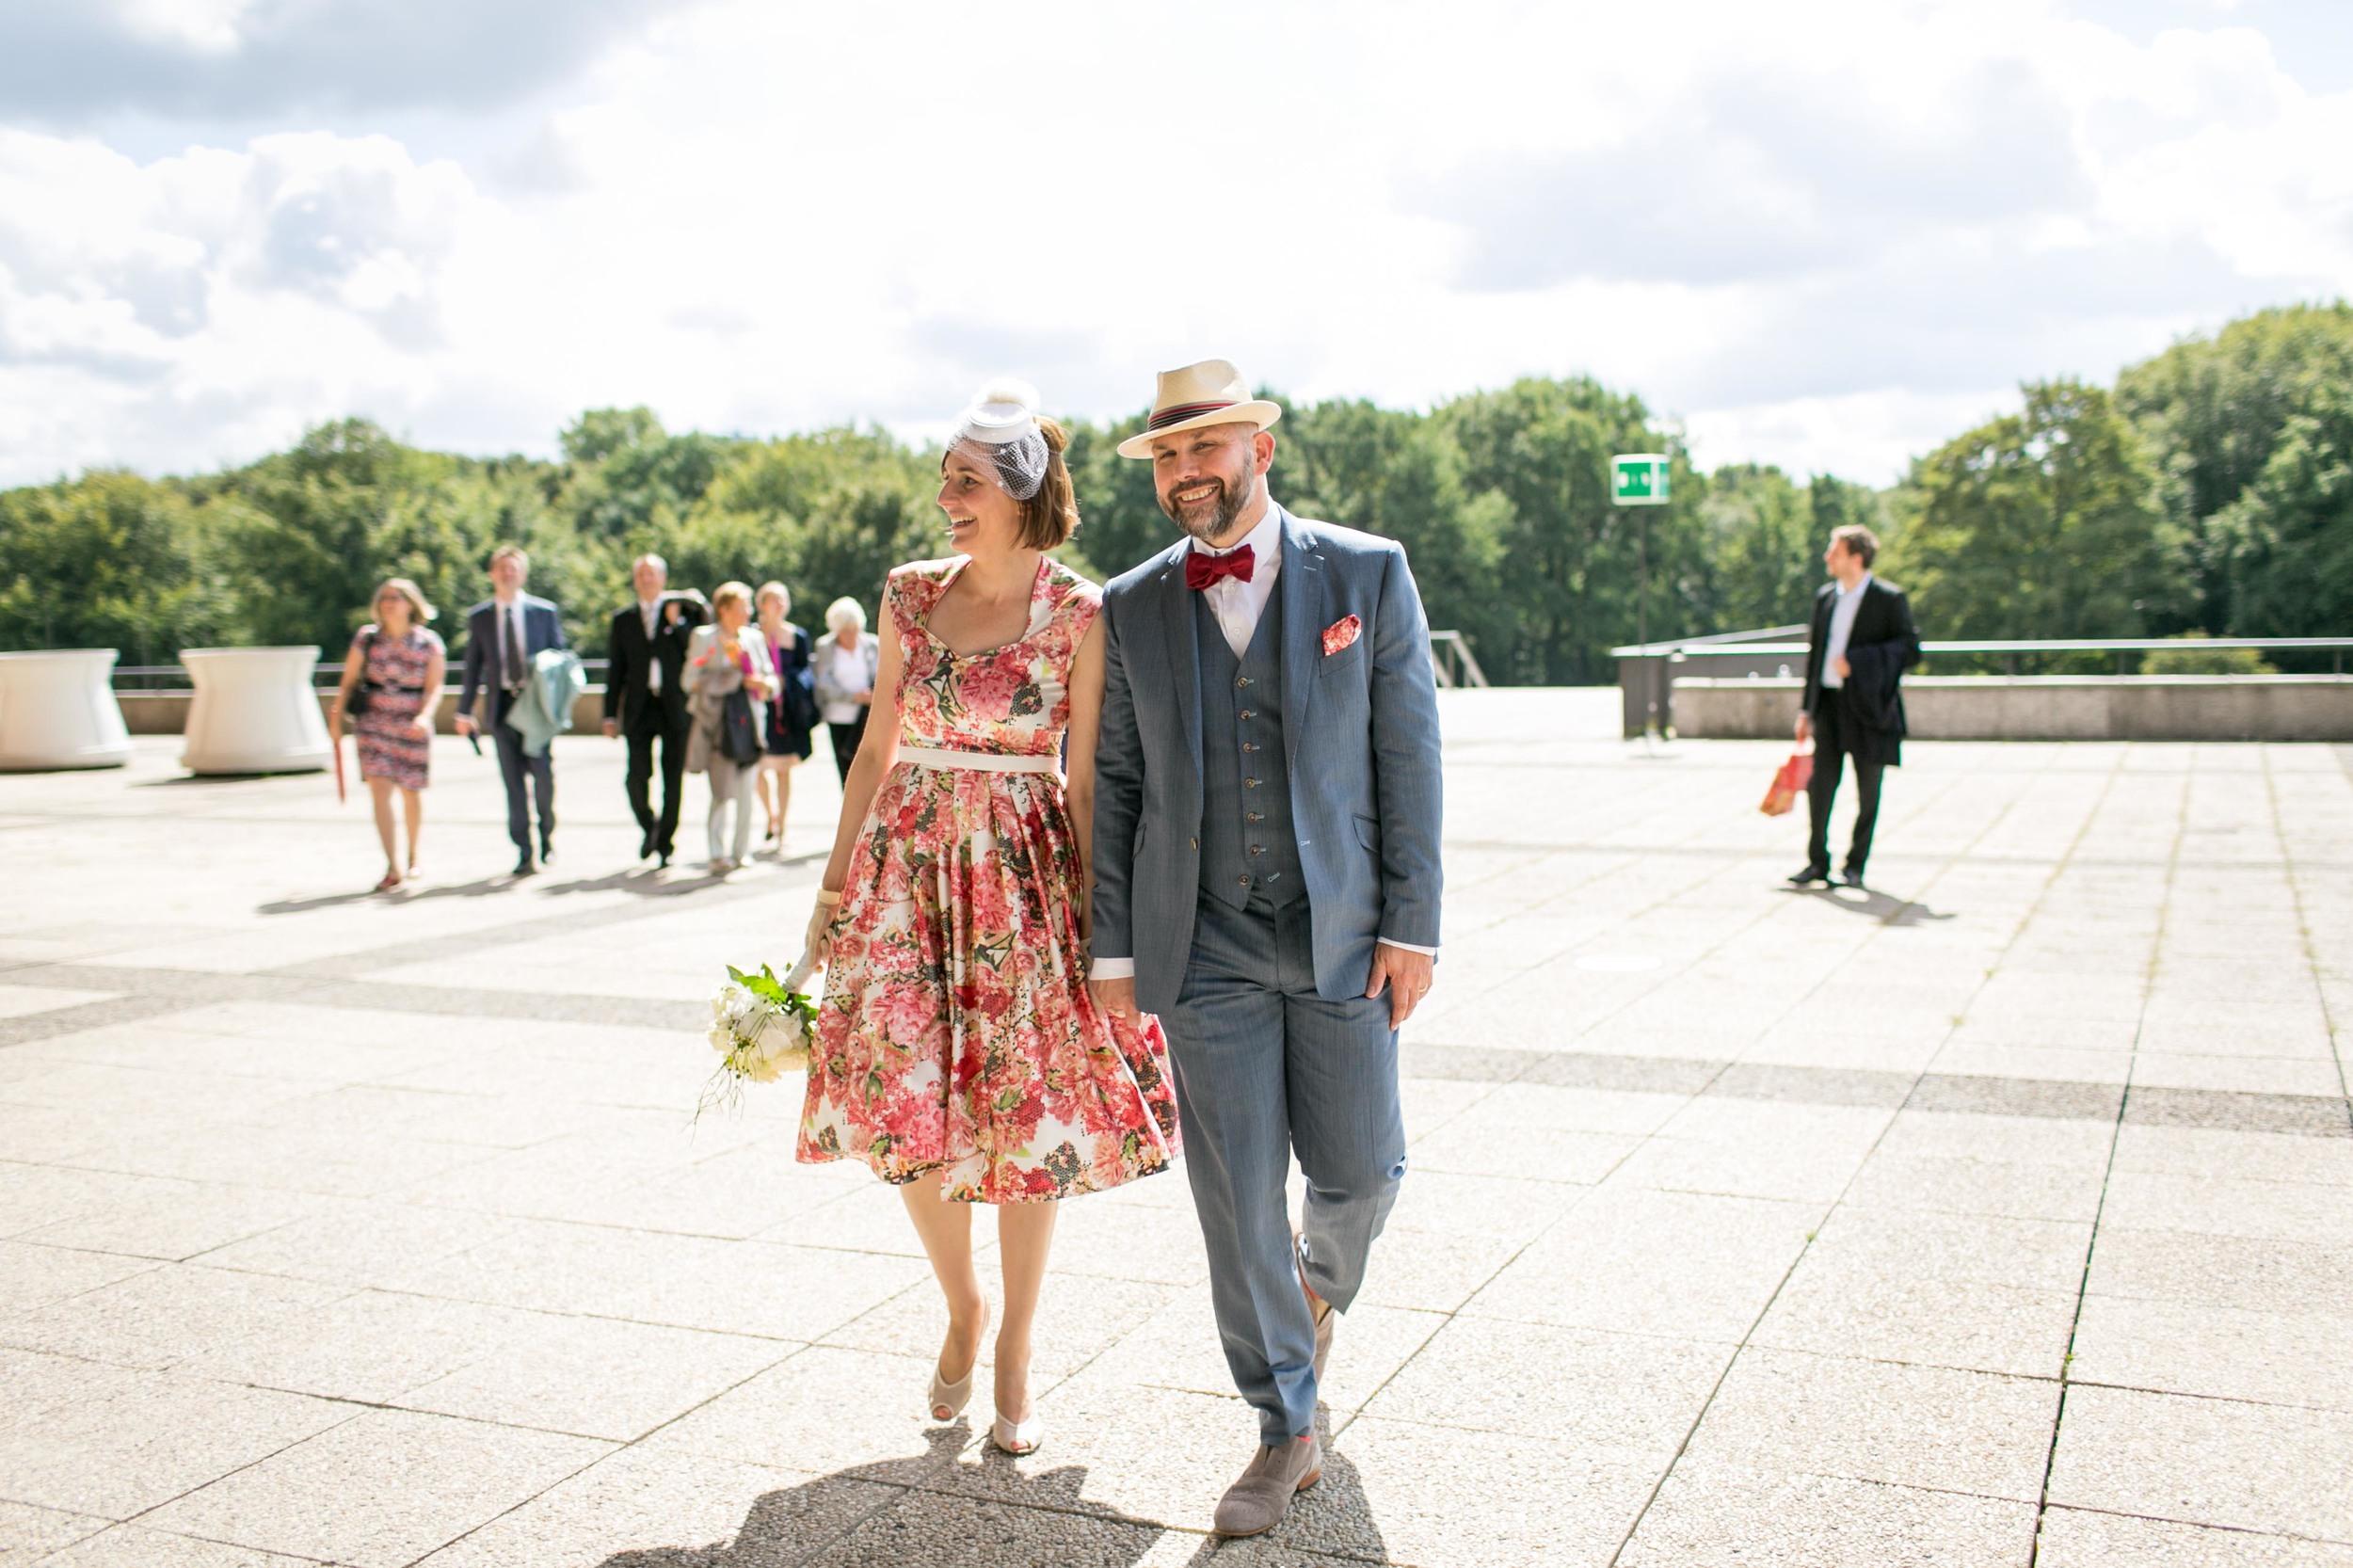 Fran Burrows Hochzeitsfotografie Berlin_Hotel Adlon-83.jpg